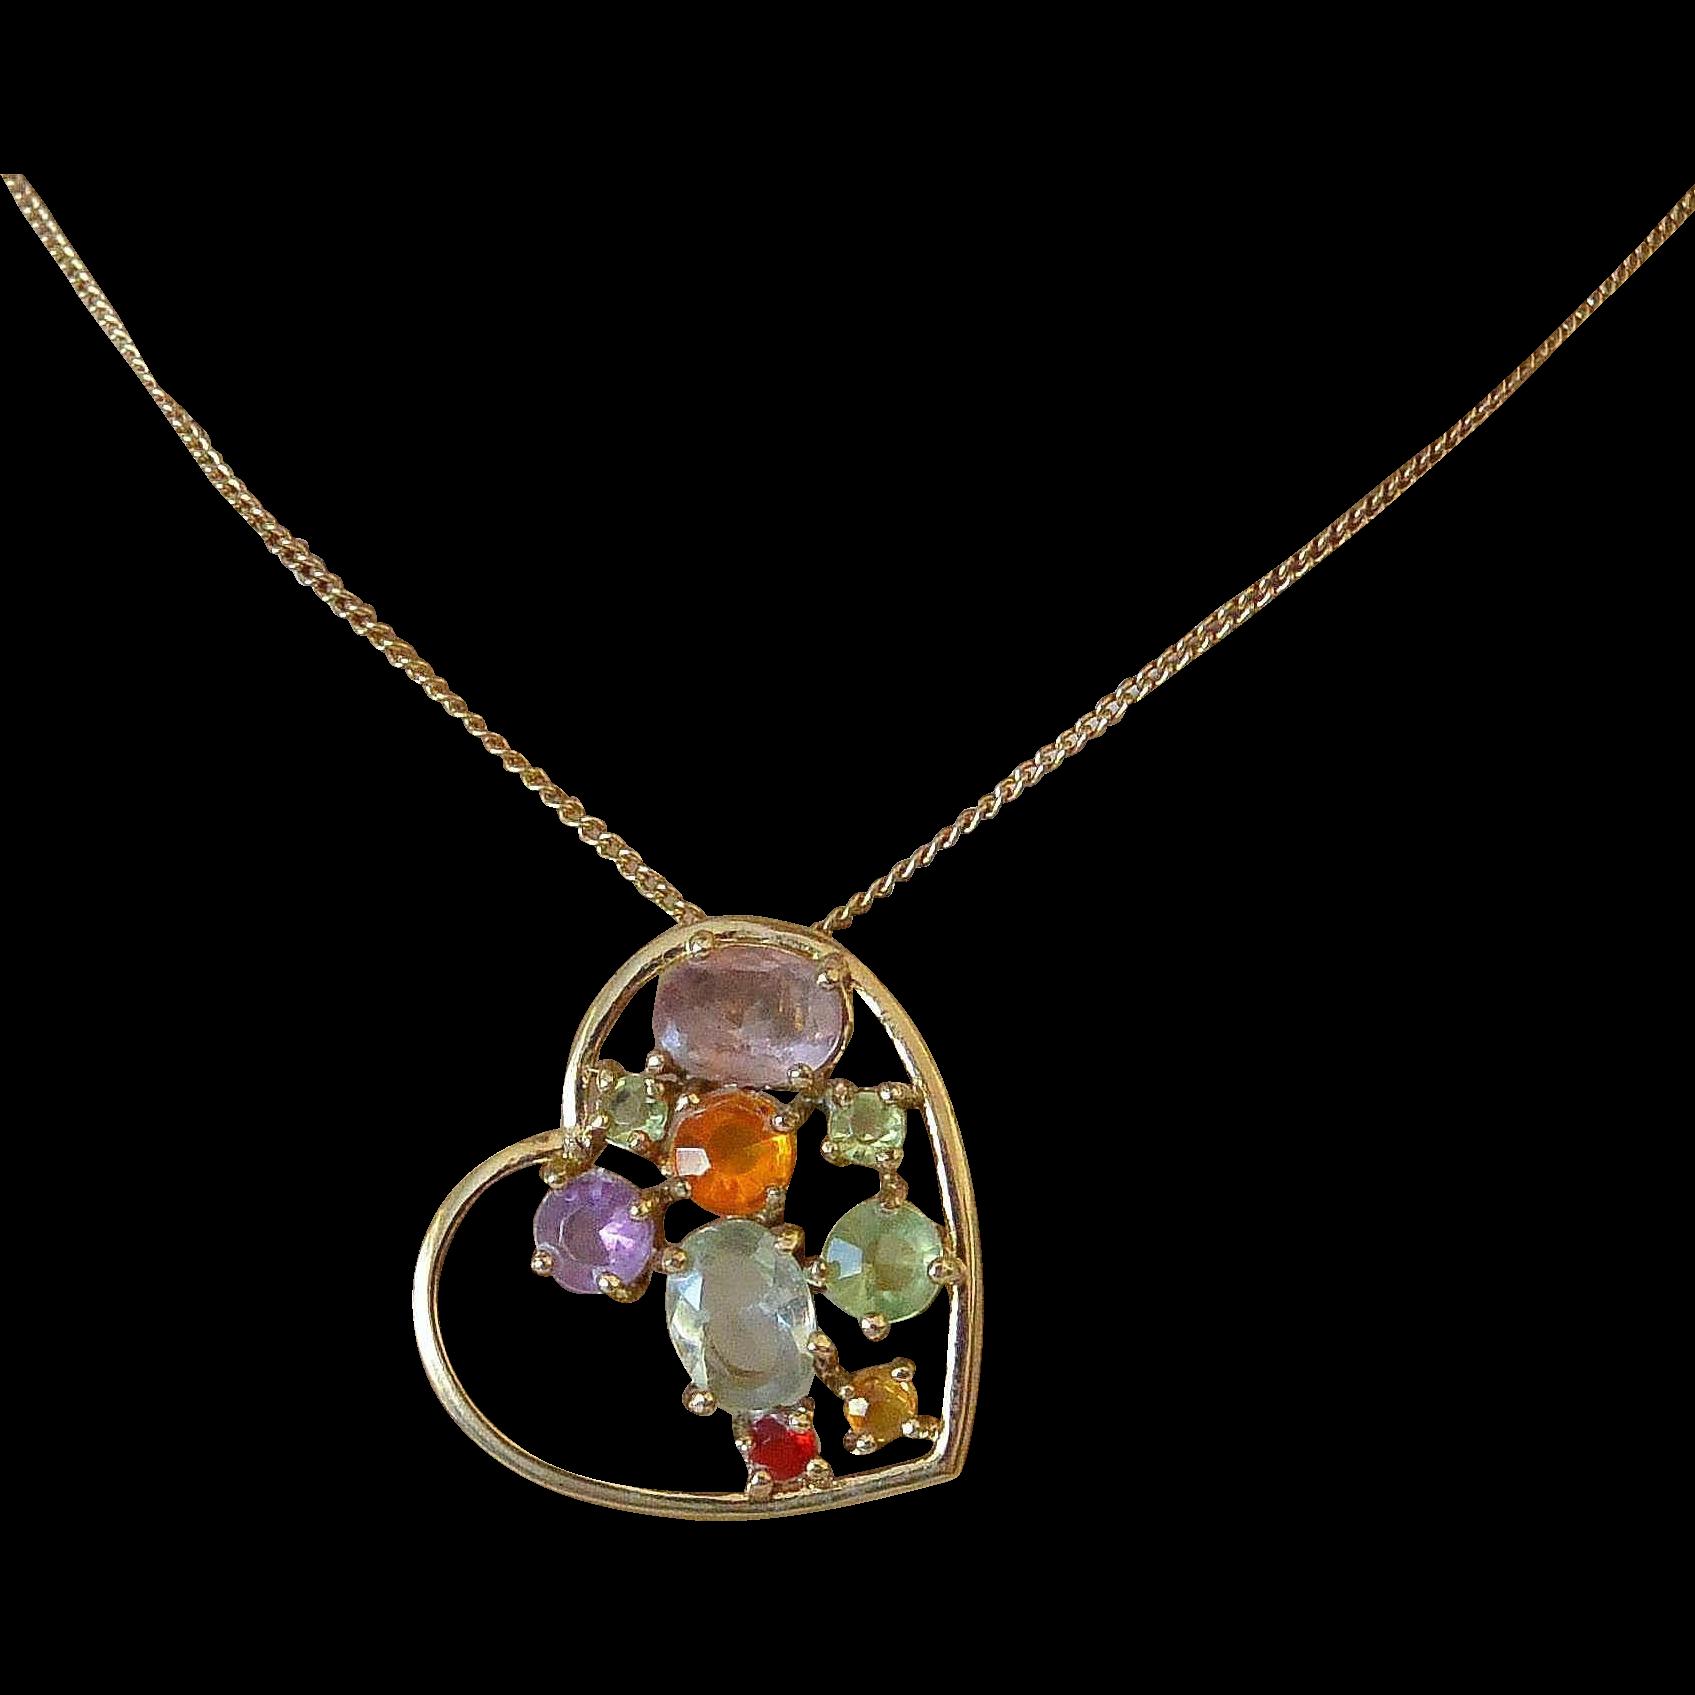 Jeweled Heart Pendant Necklace